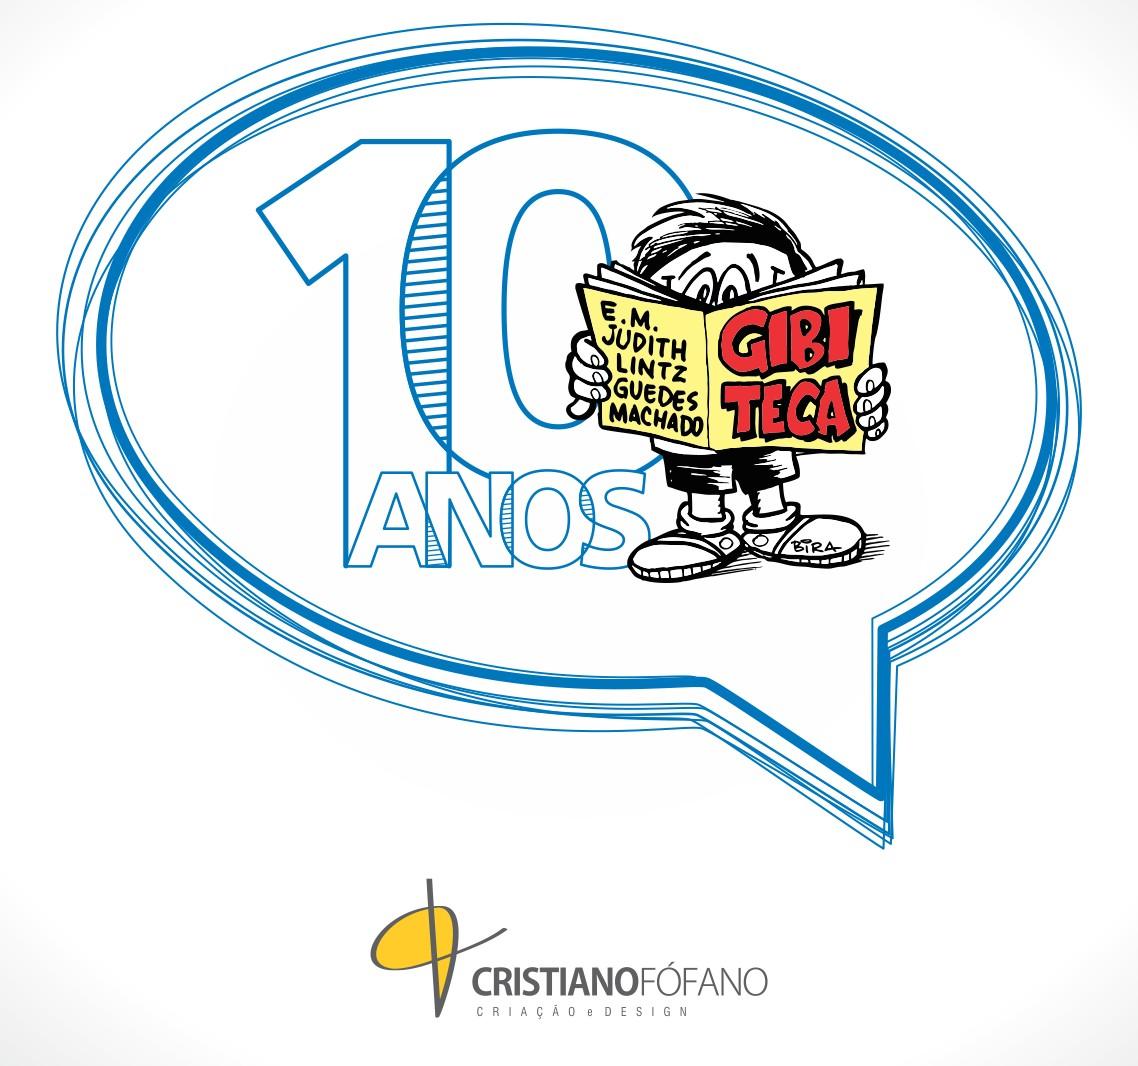 10 ANOS DA GIBITECA